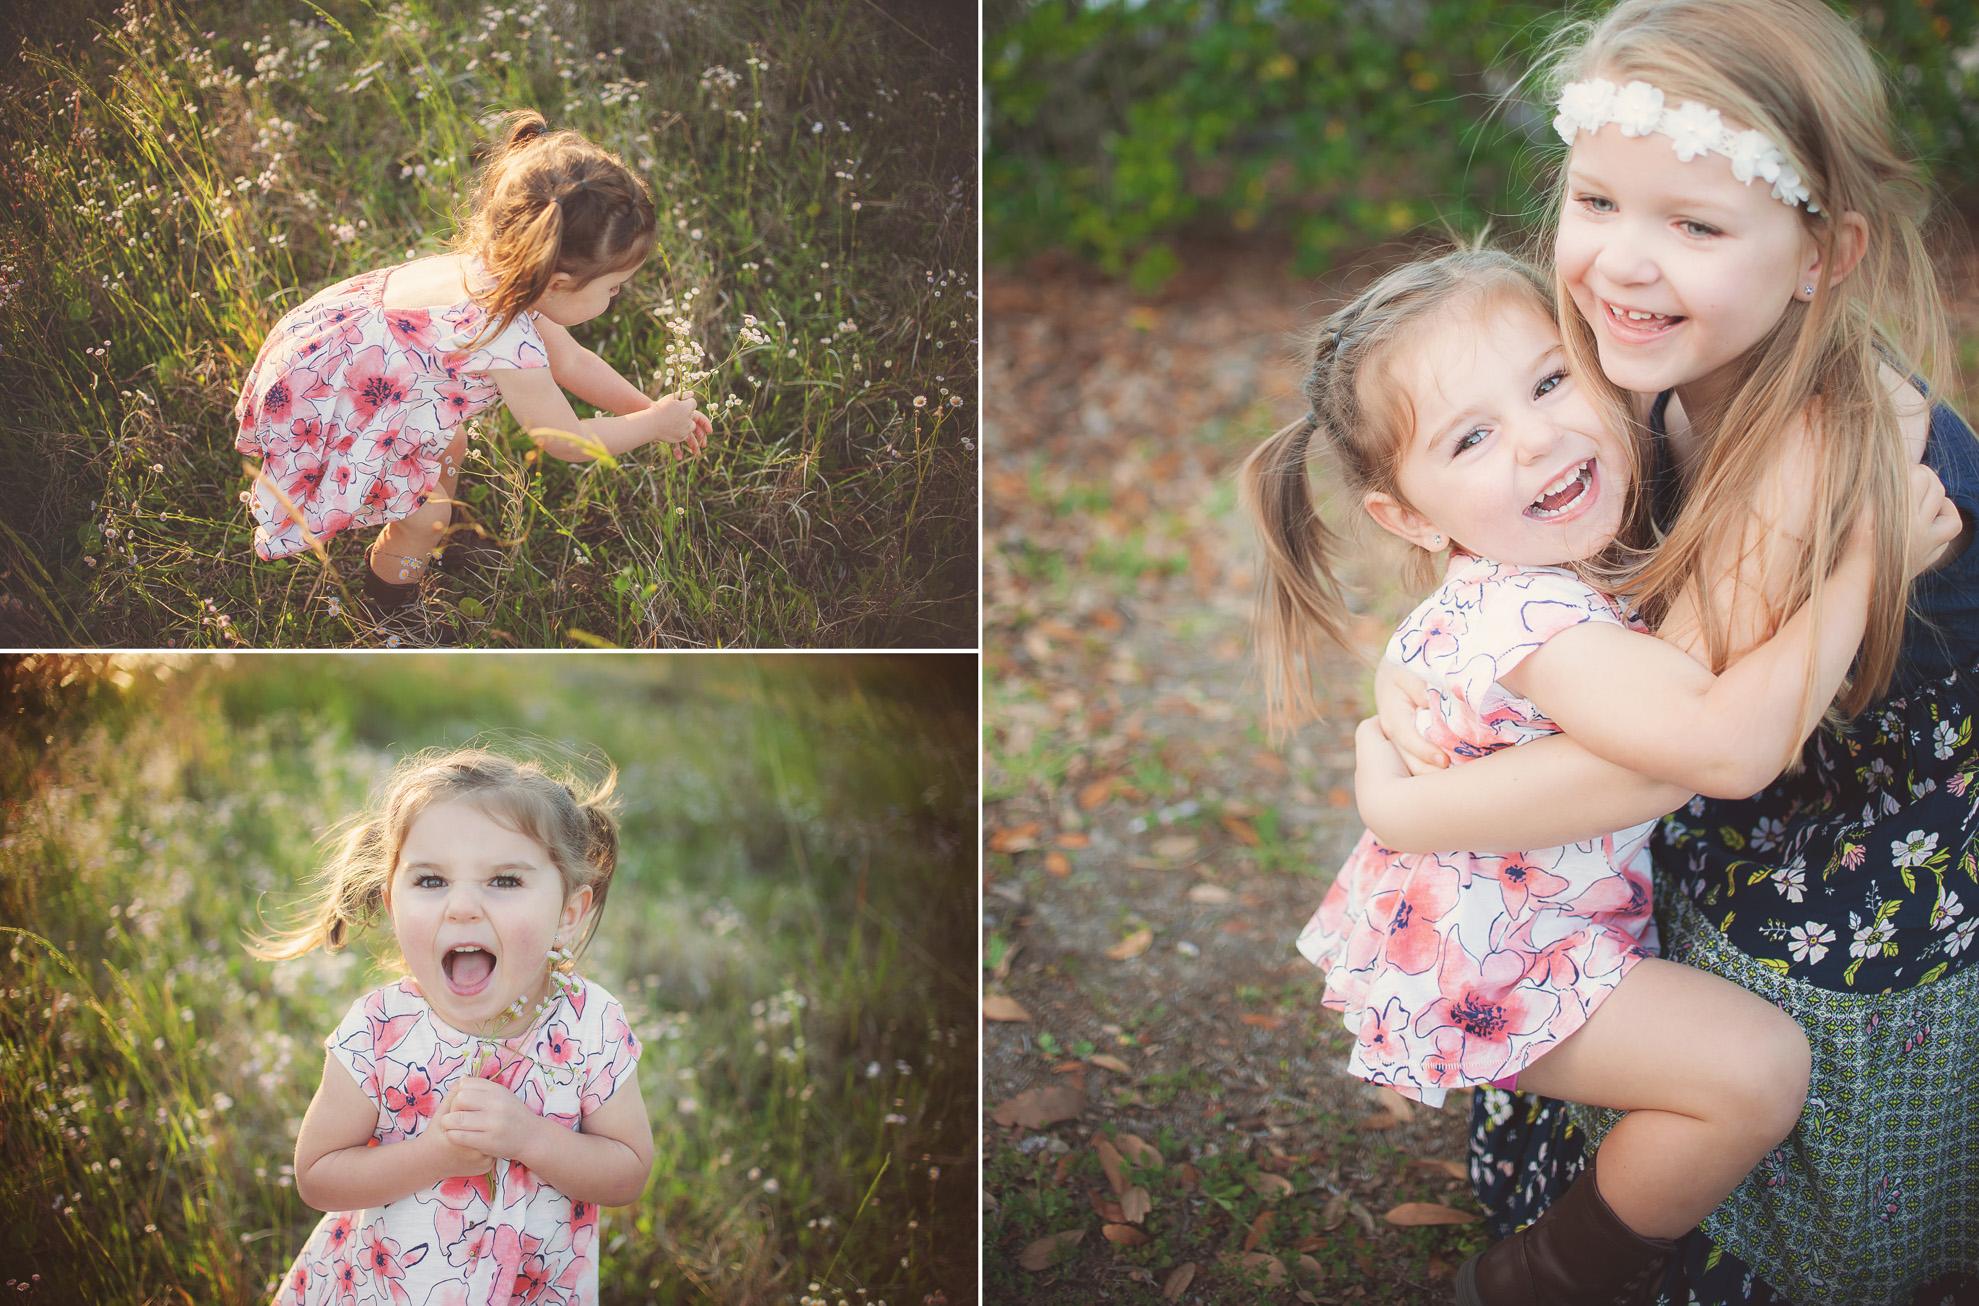 adam-szarmack-family-portraits-photography-love-5.jpg